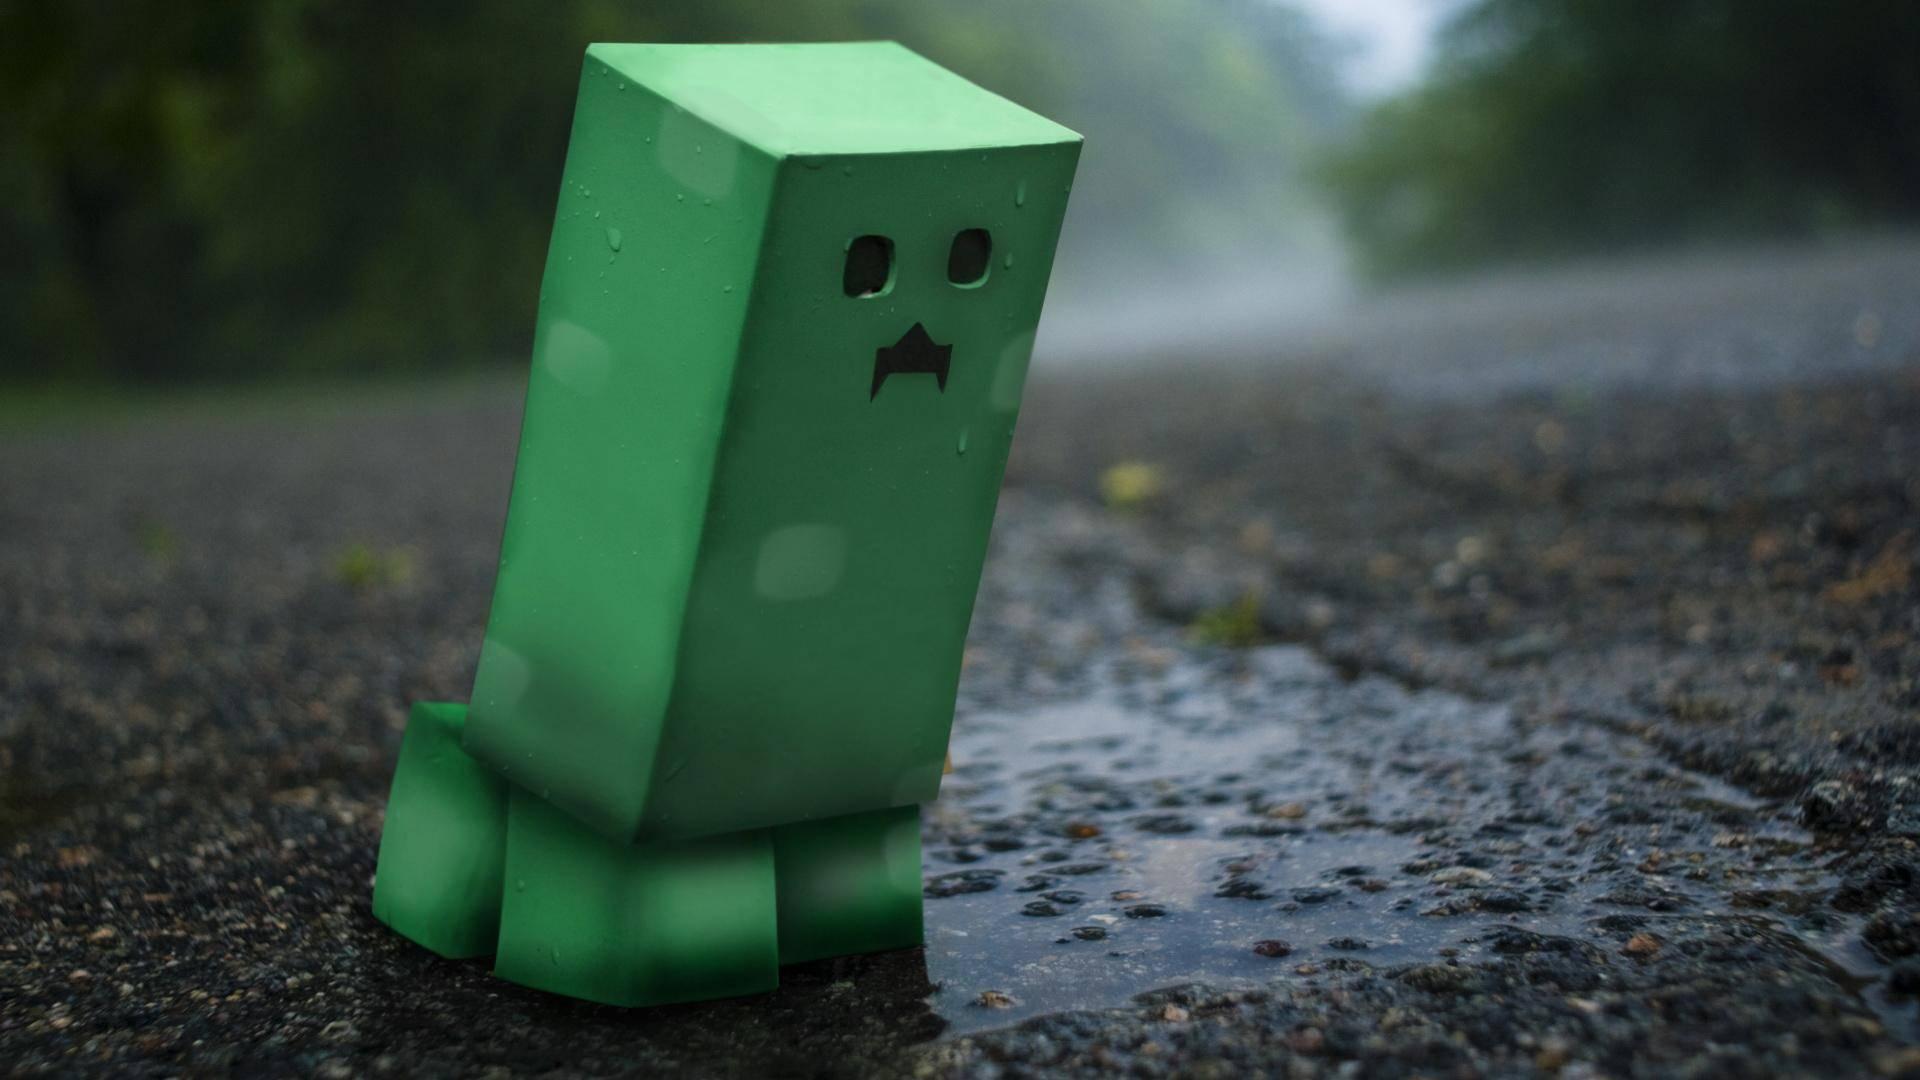 Minecraft Background Shaders 2015 MineCraft News Hub 1920x1080